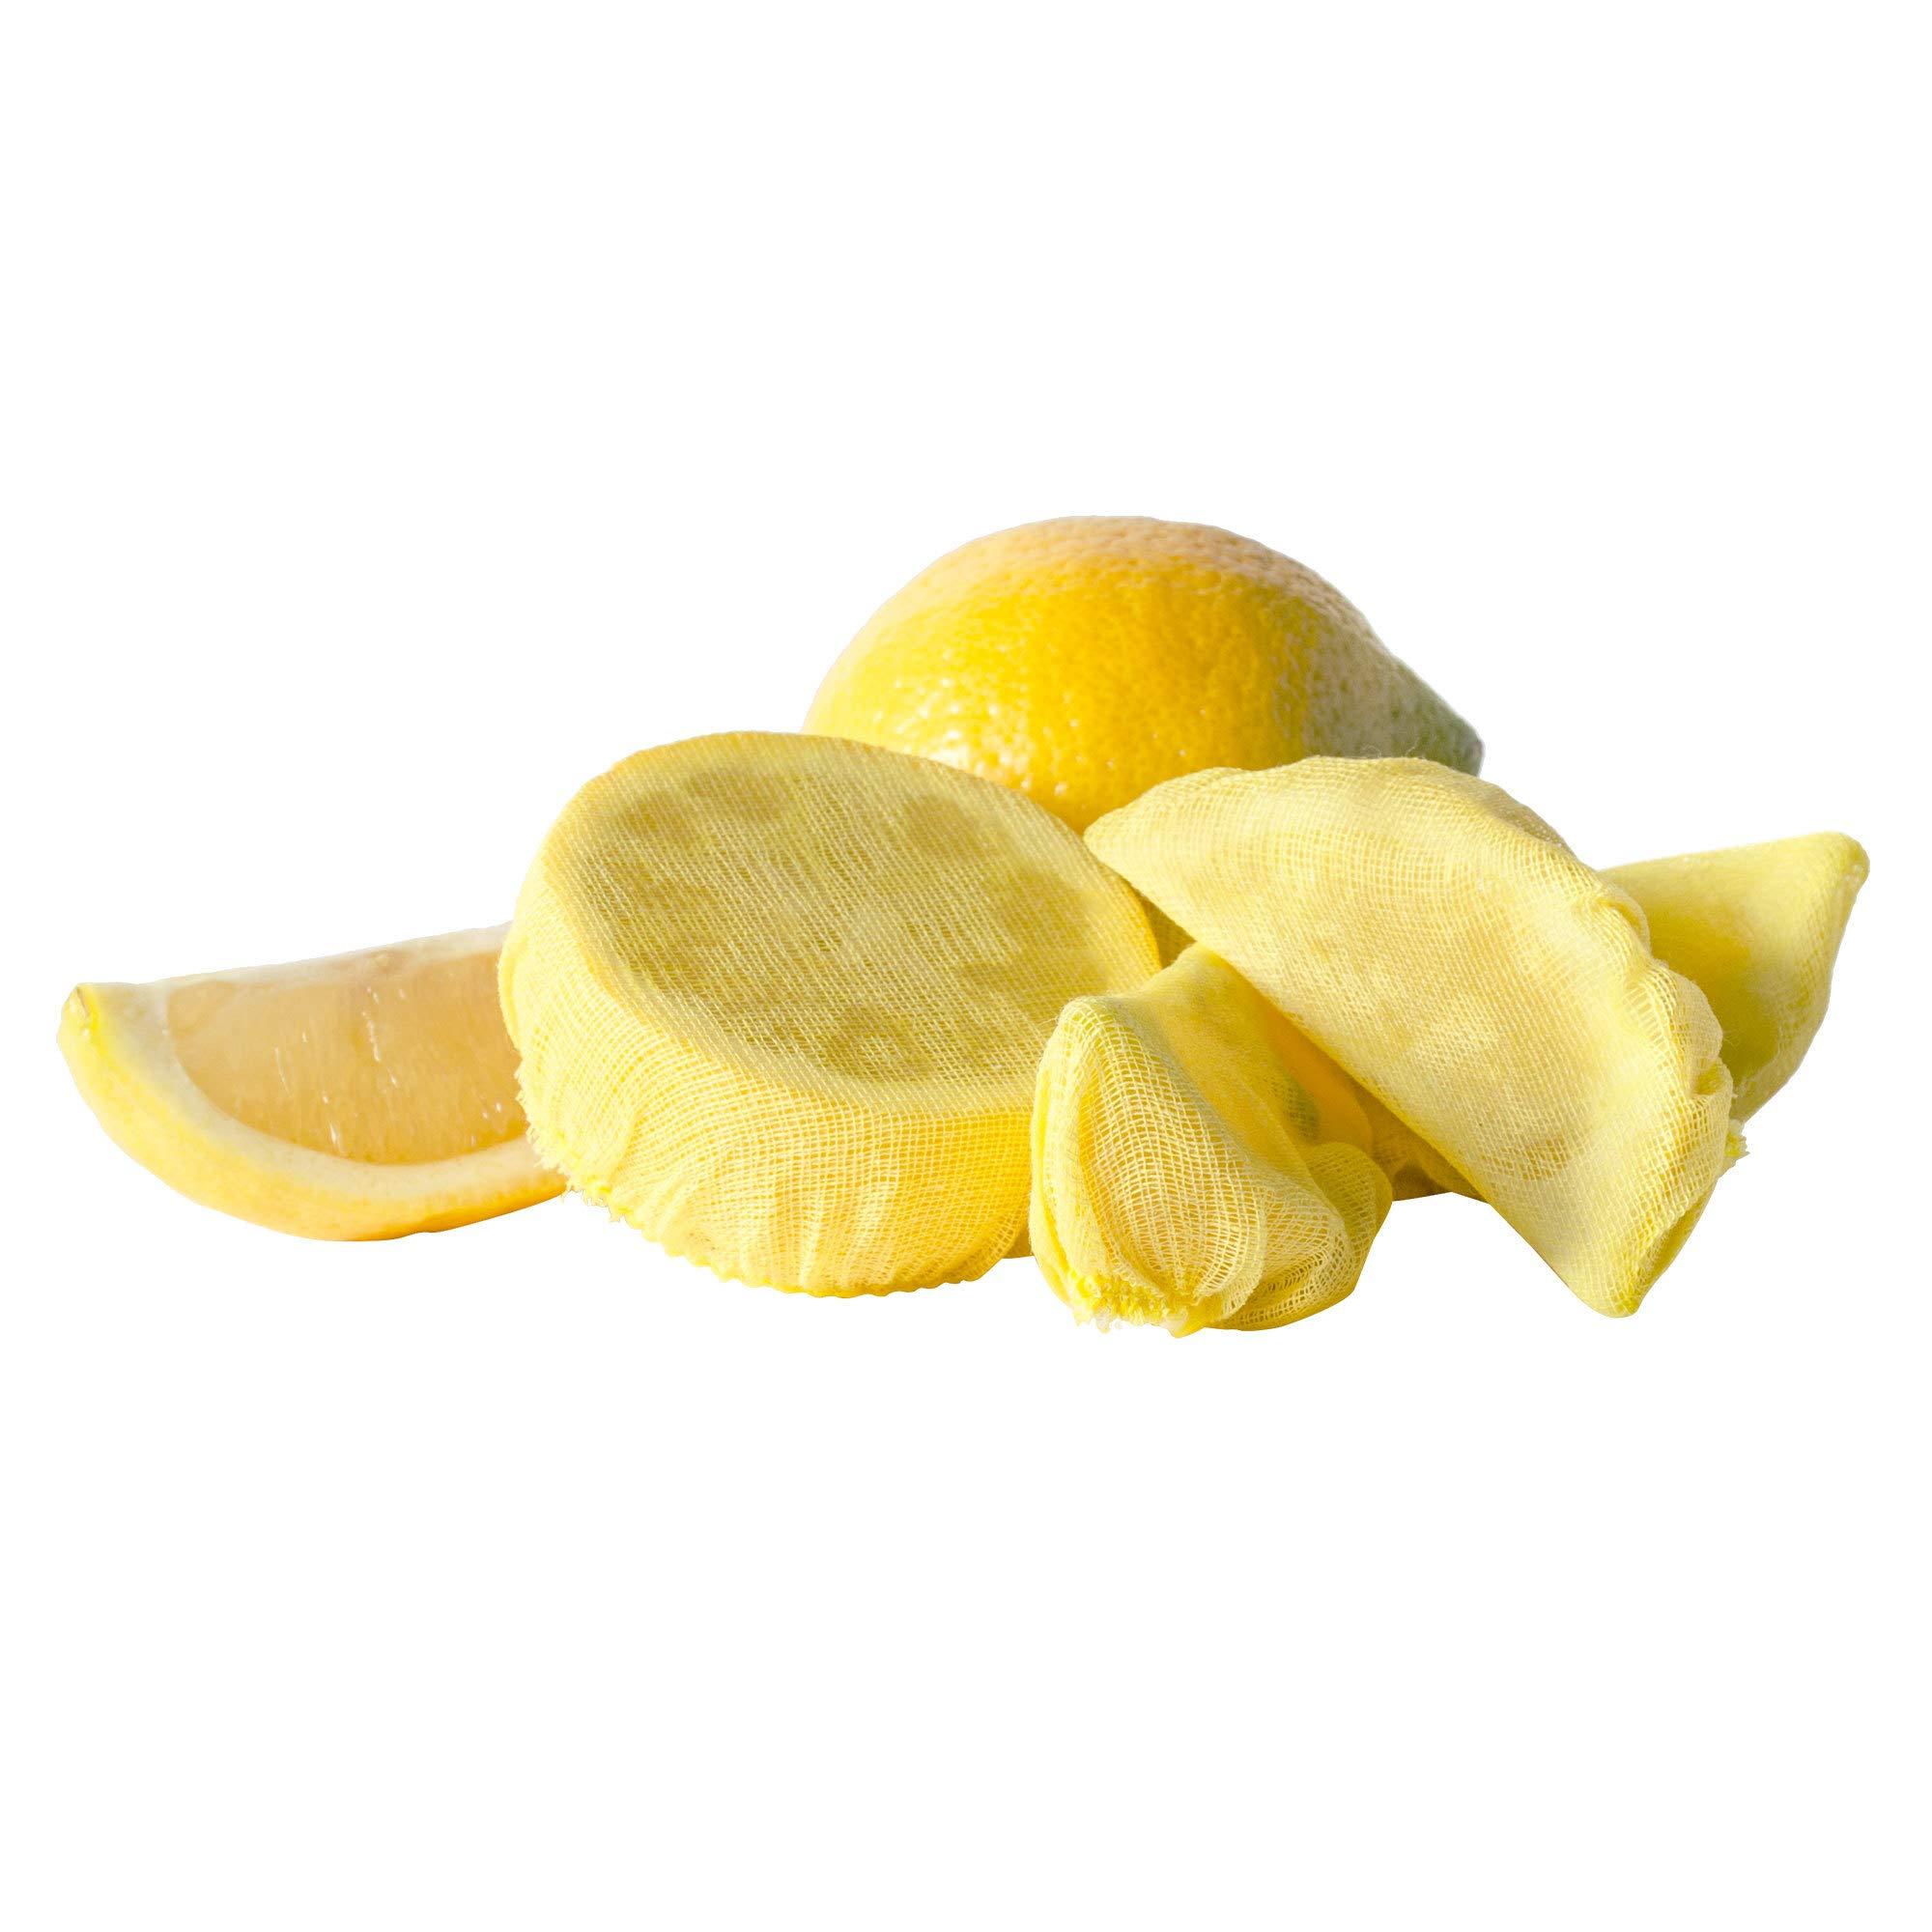 TableTop King Paper RLWB25 Yellow Lemon Wedge Bag - 100/Pack